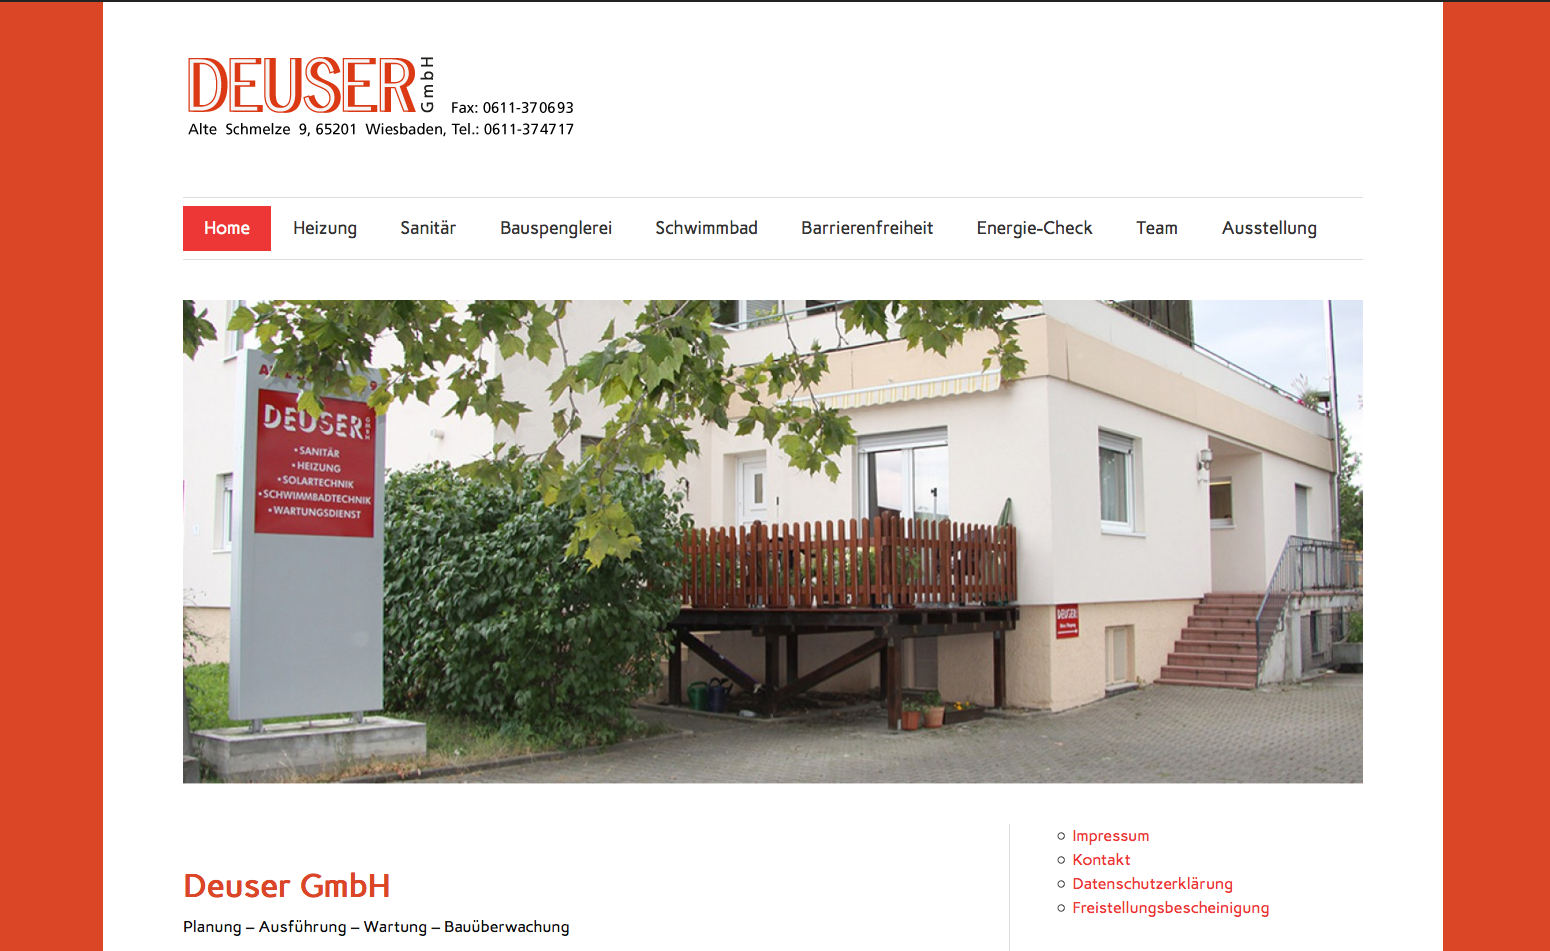 Deuser GmbH